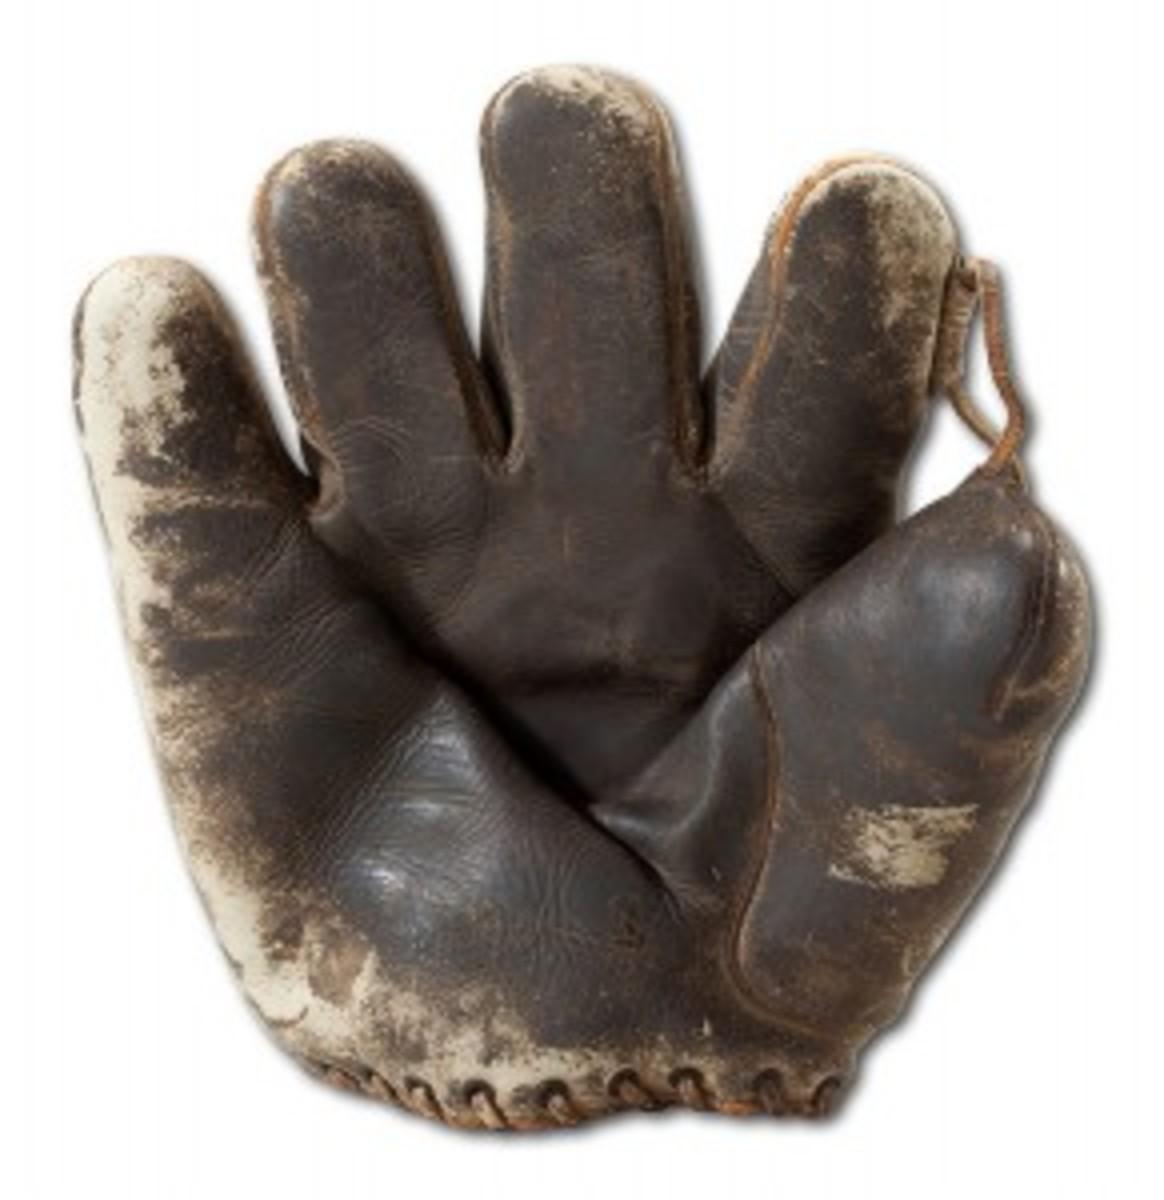 Herb Pennock 1927 Glove